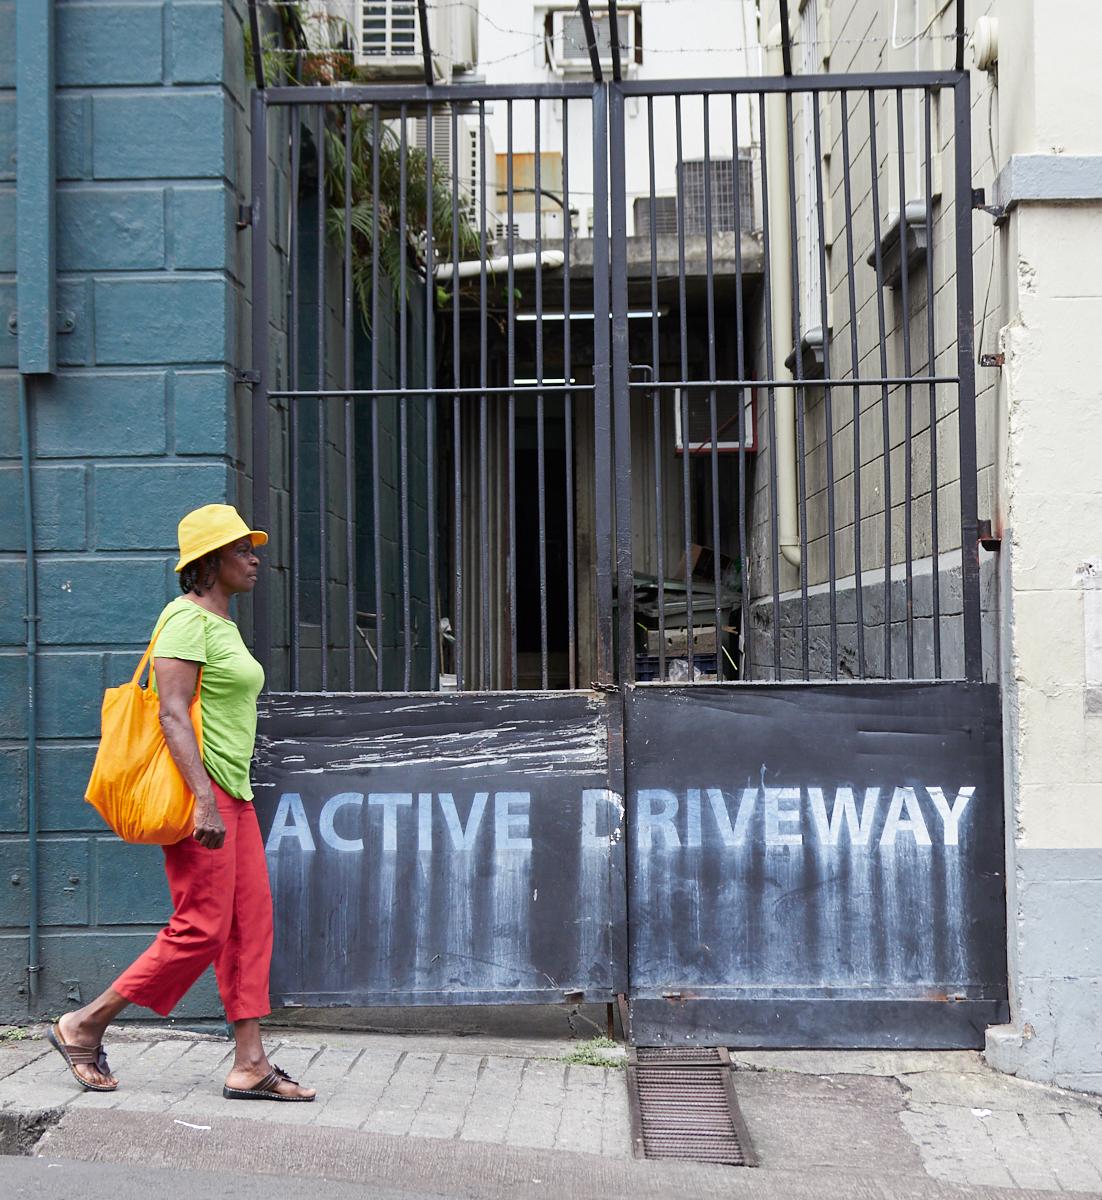 Active driveway1600x1200 sRGB.jpg